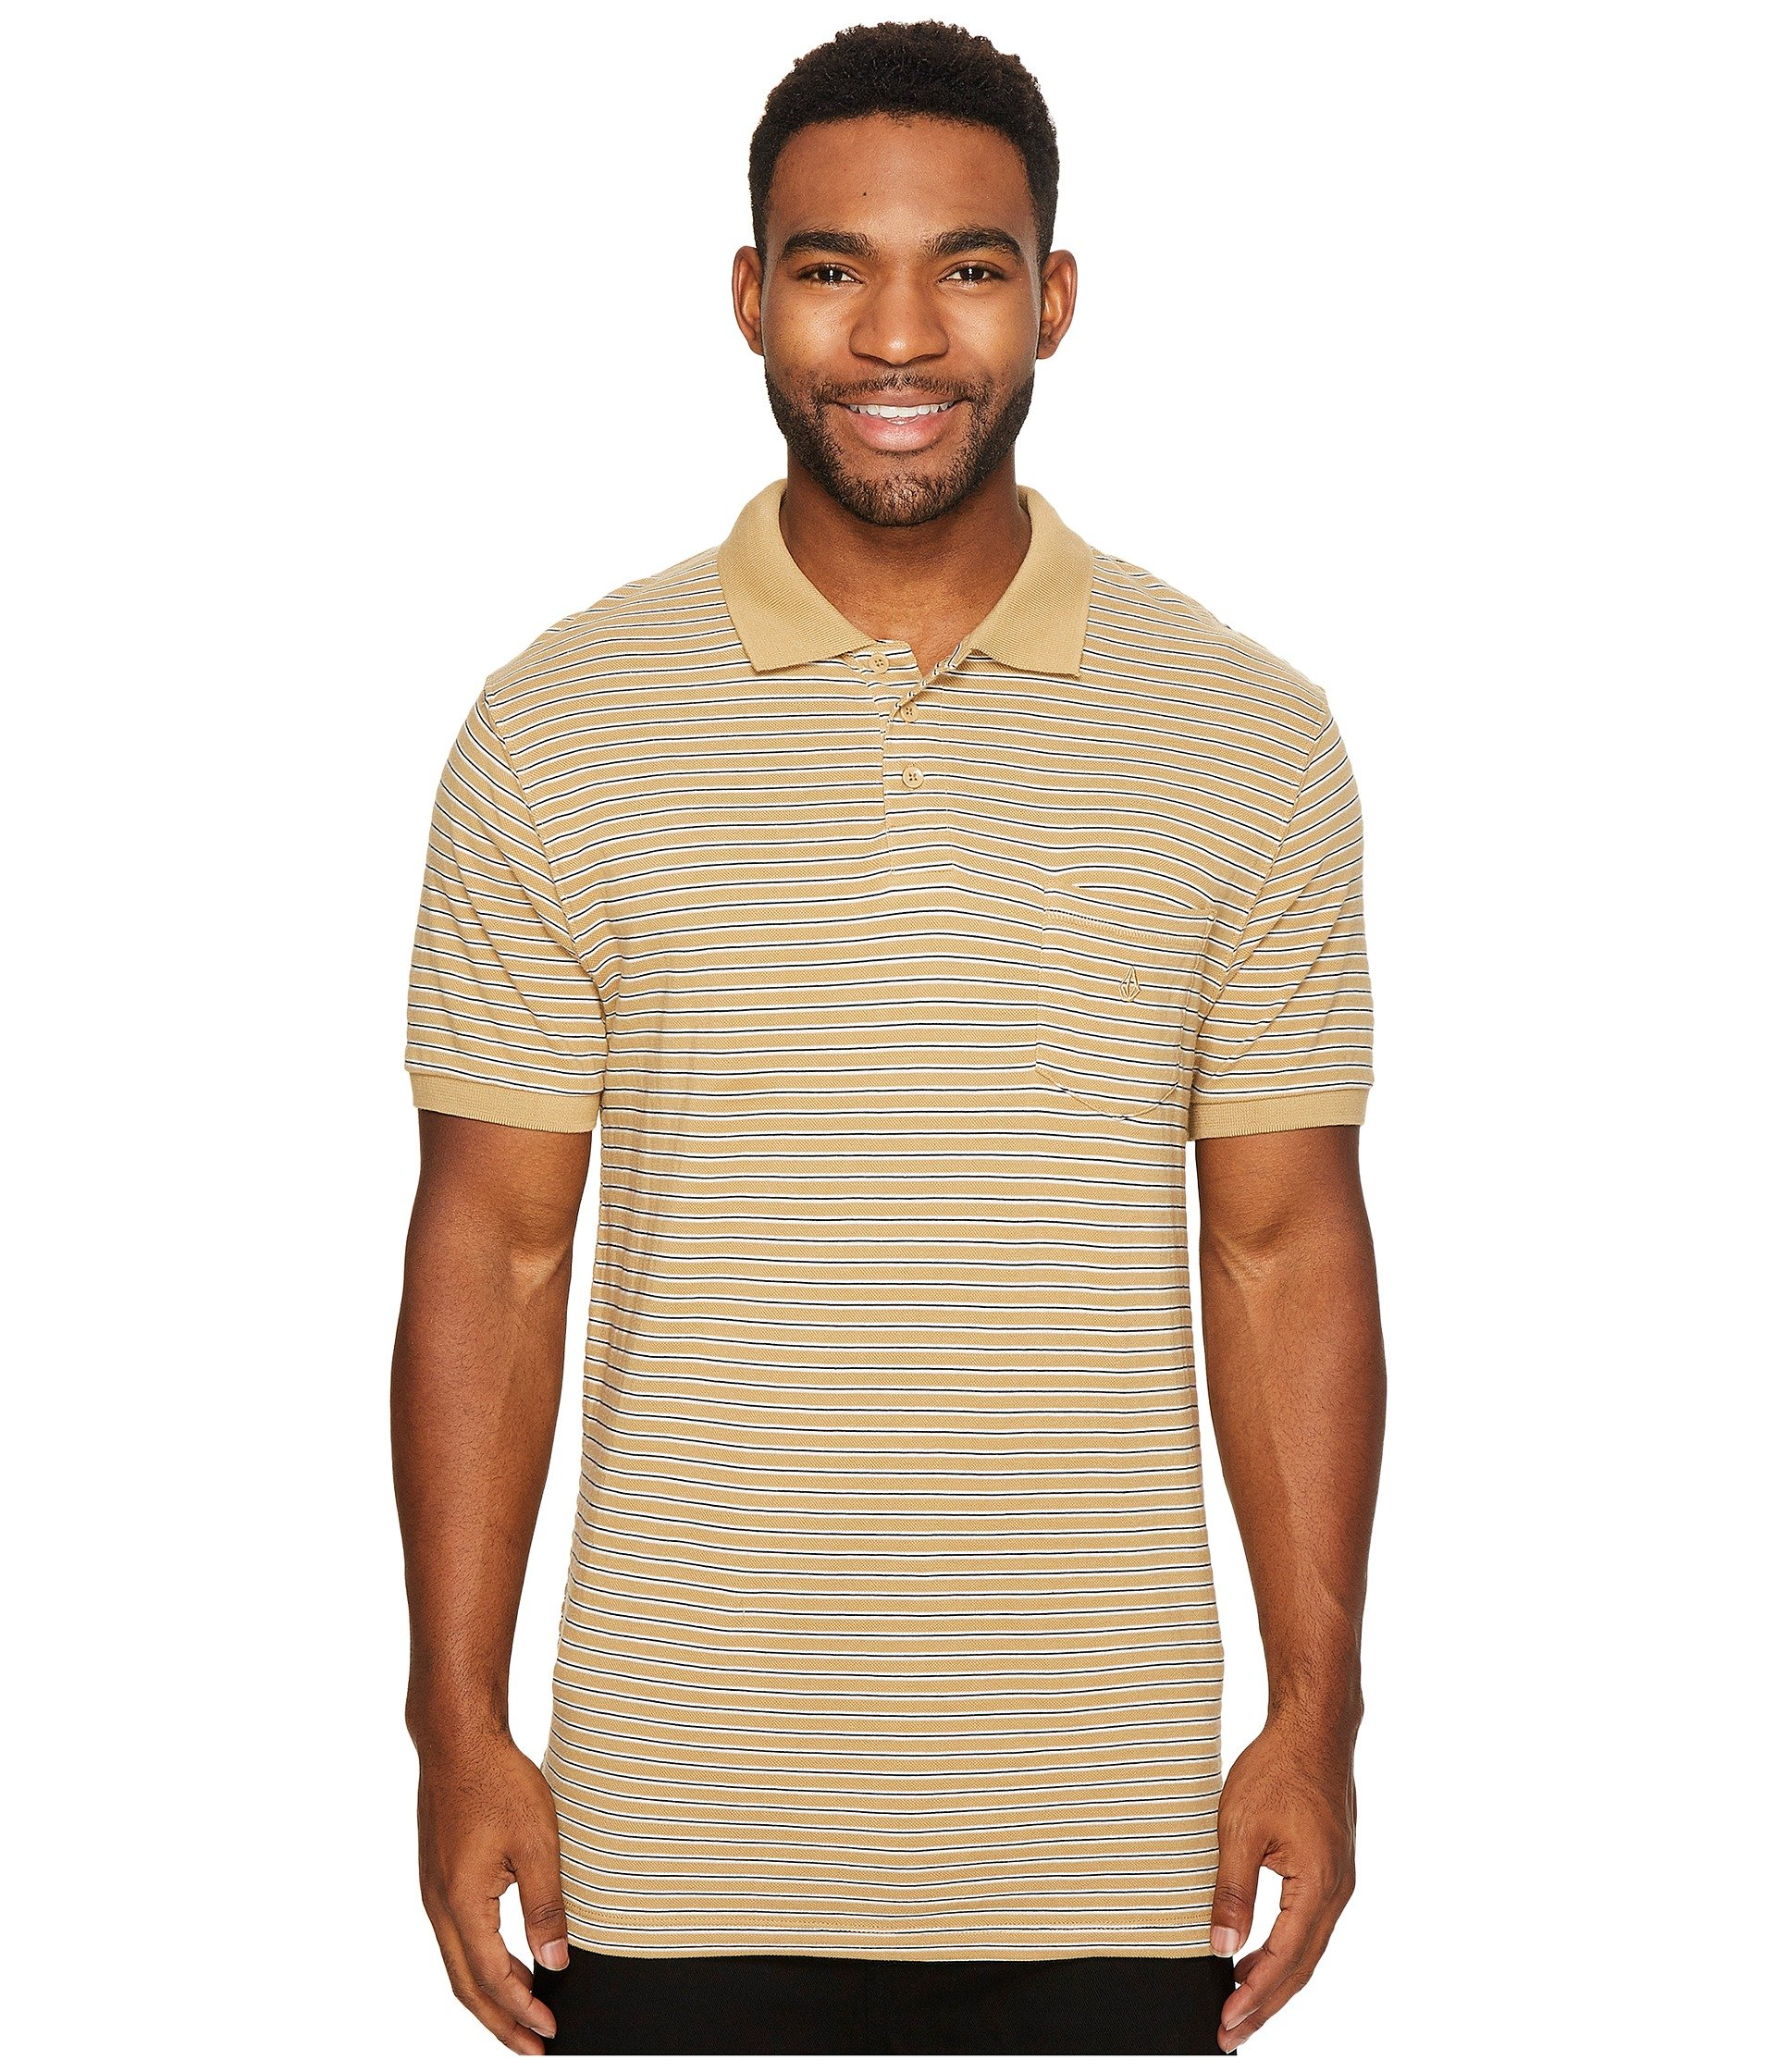 Camiseta Tipo Polo para Hombre Volcom Wowzer Stripe Polo  + Volcom en VeoyCompro.net